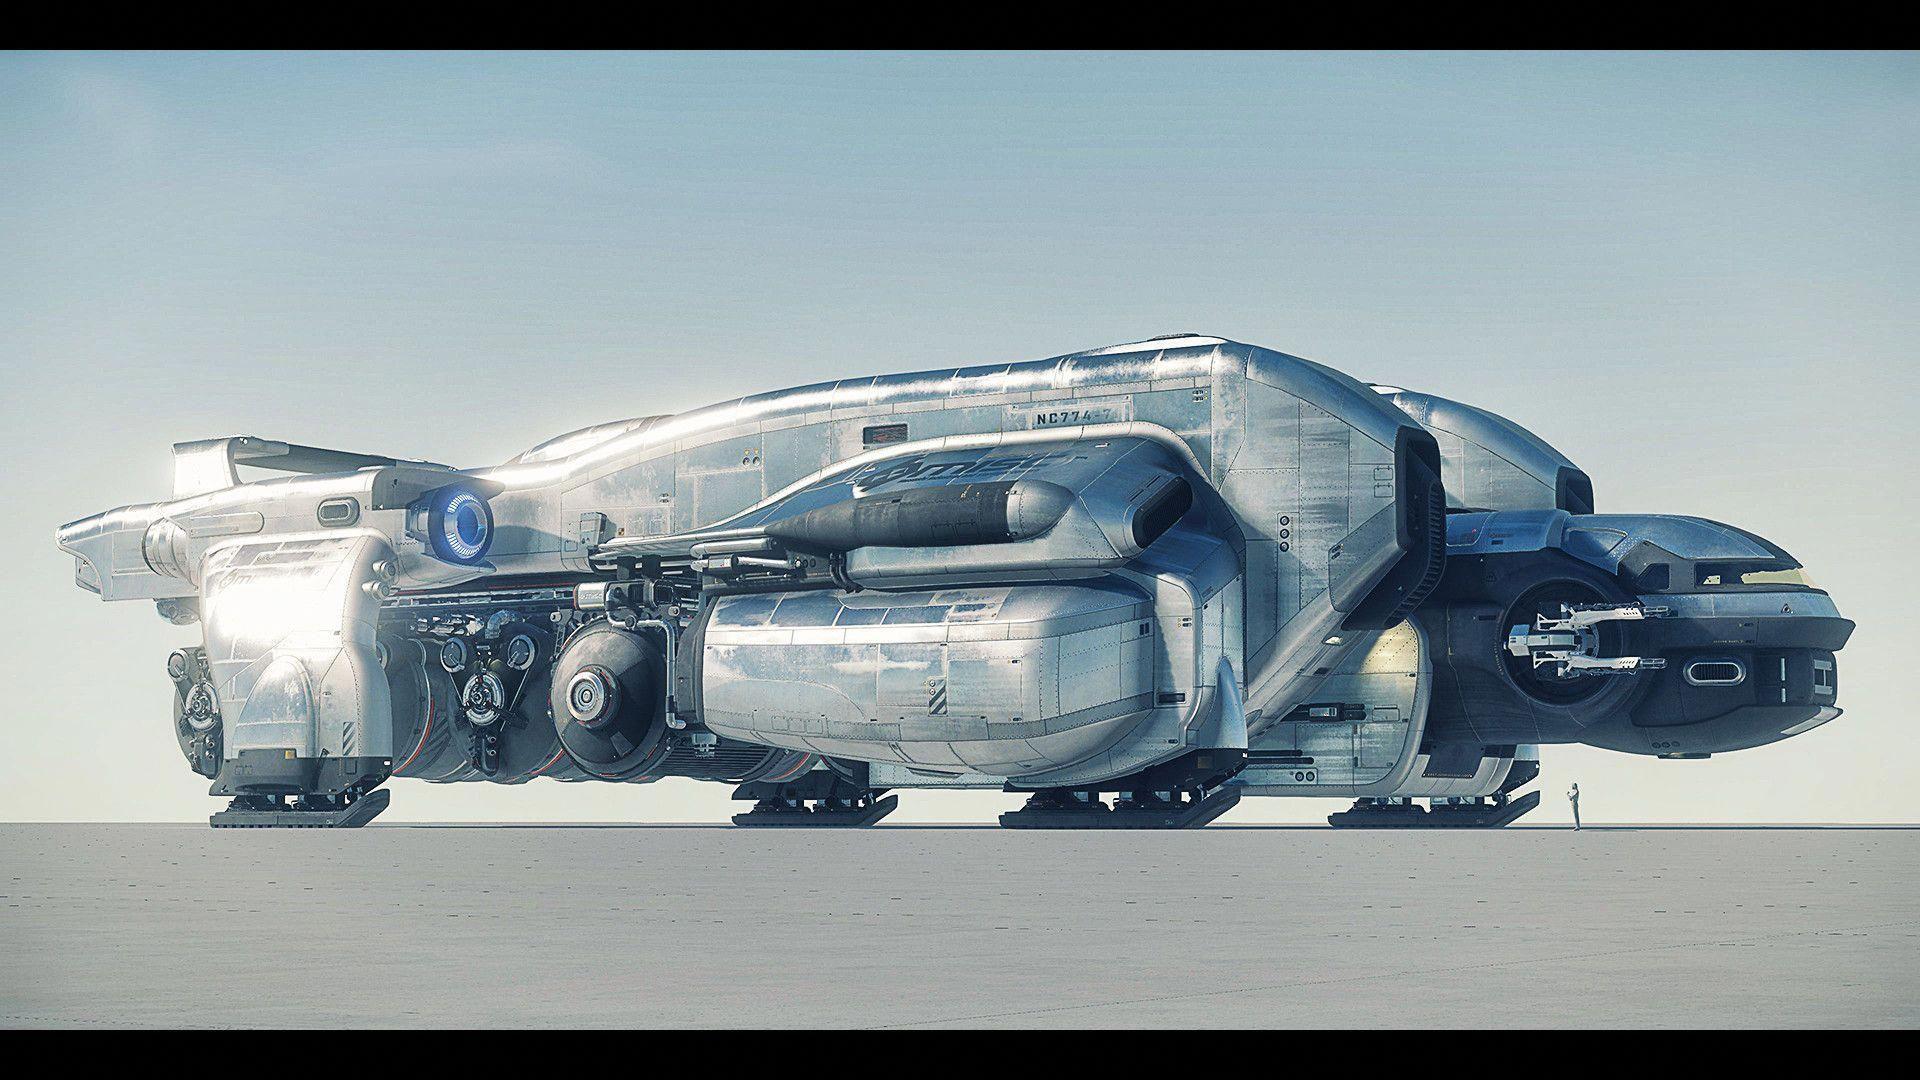 (Starfarer Photo Courtesy of Musashi Industrial and Starflight Concern)